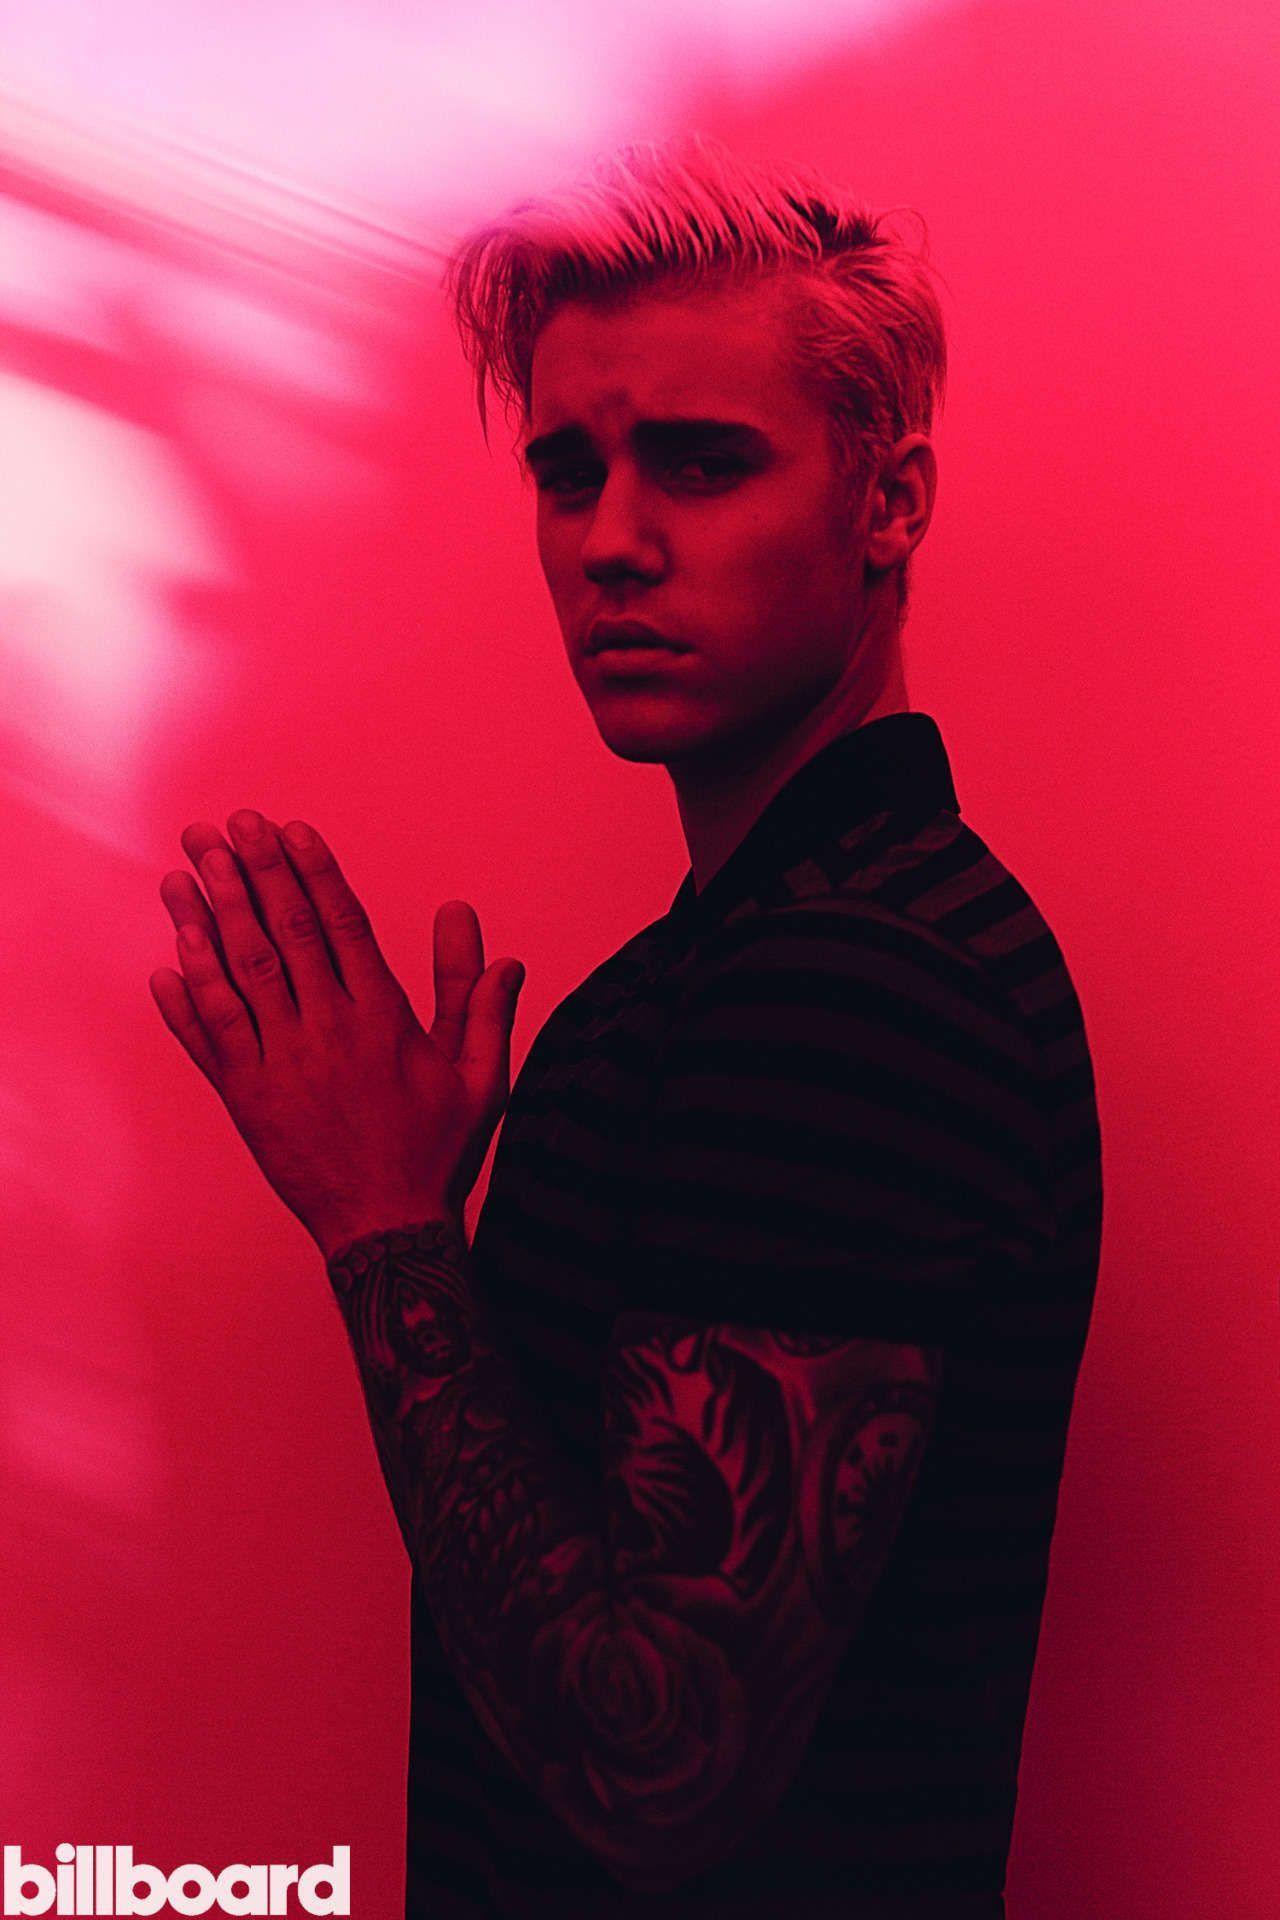 Justin Bieber Wallpaper HD 2018 64 images